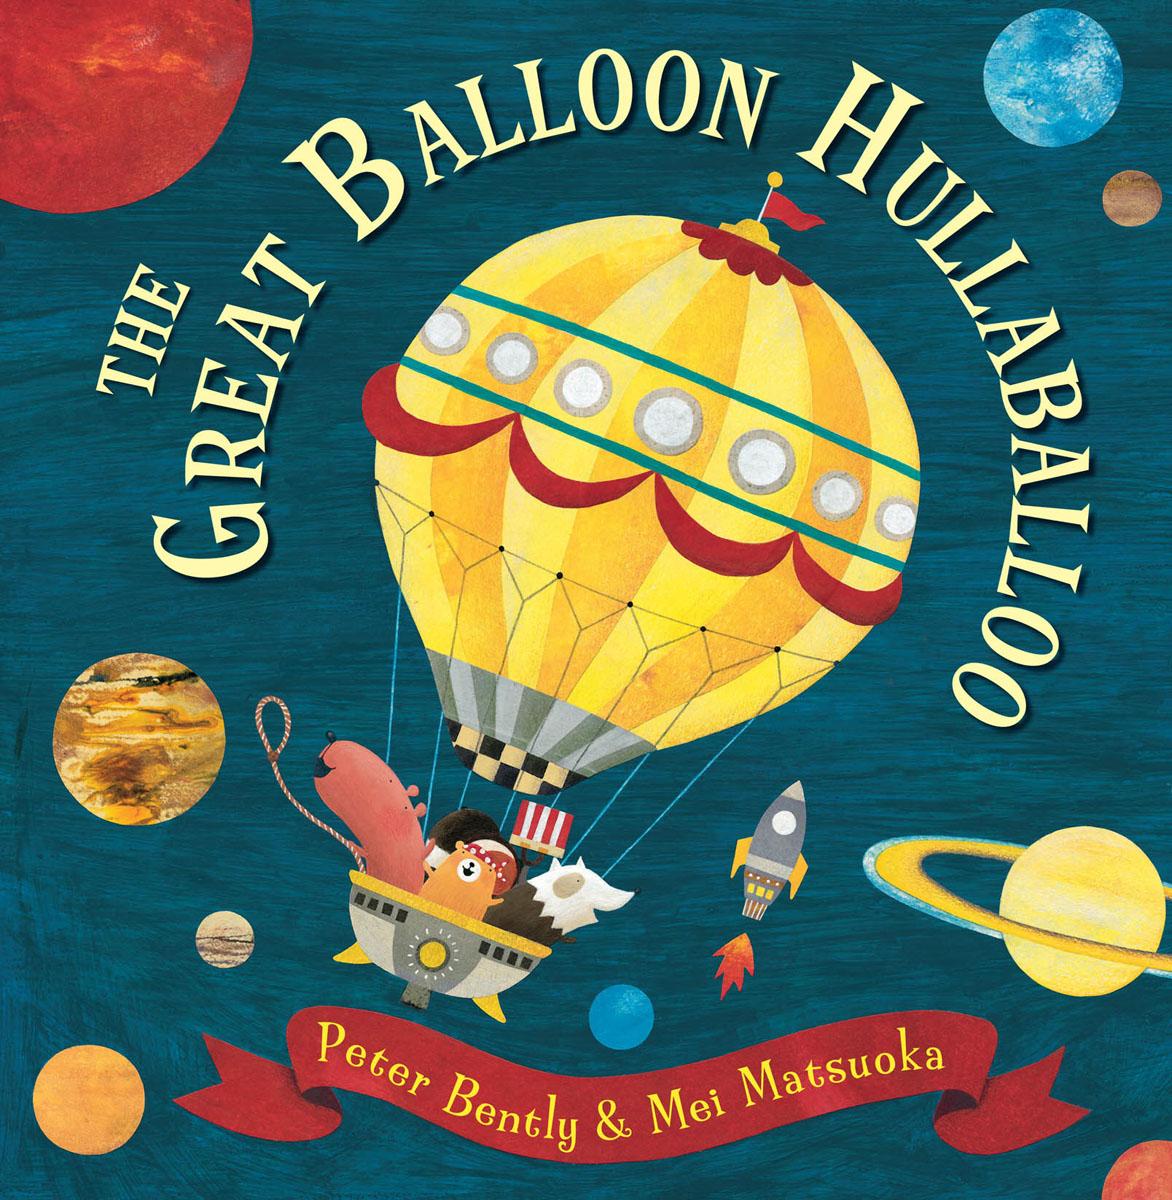 The Great Balloon Hullaballoo driven to distraction